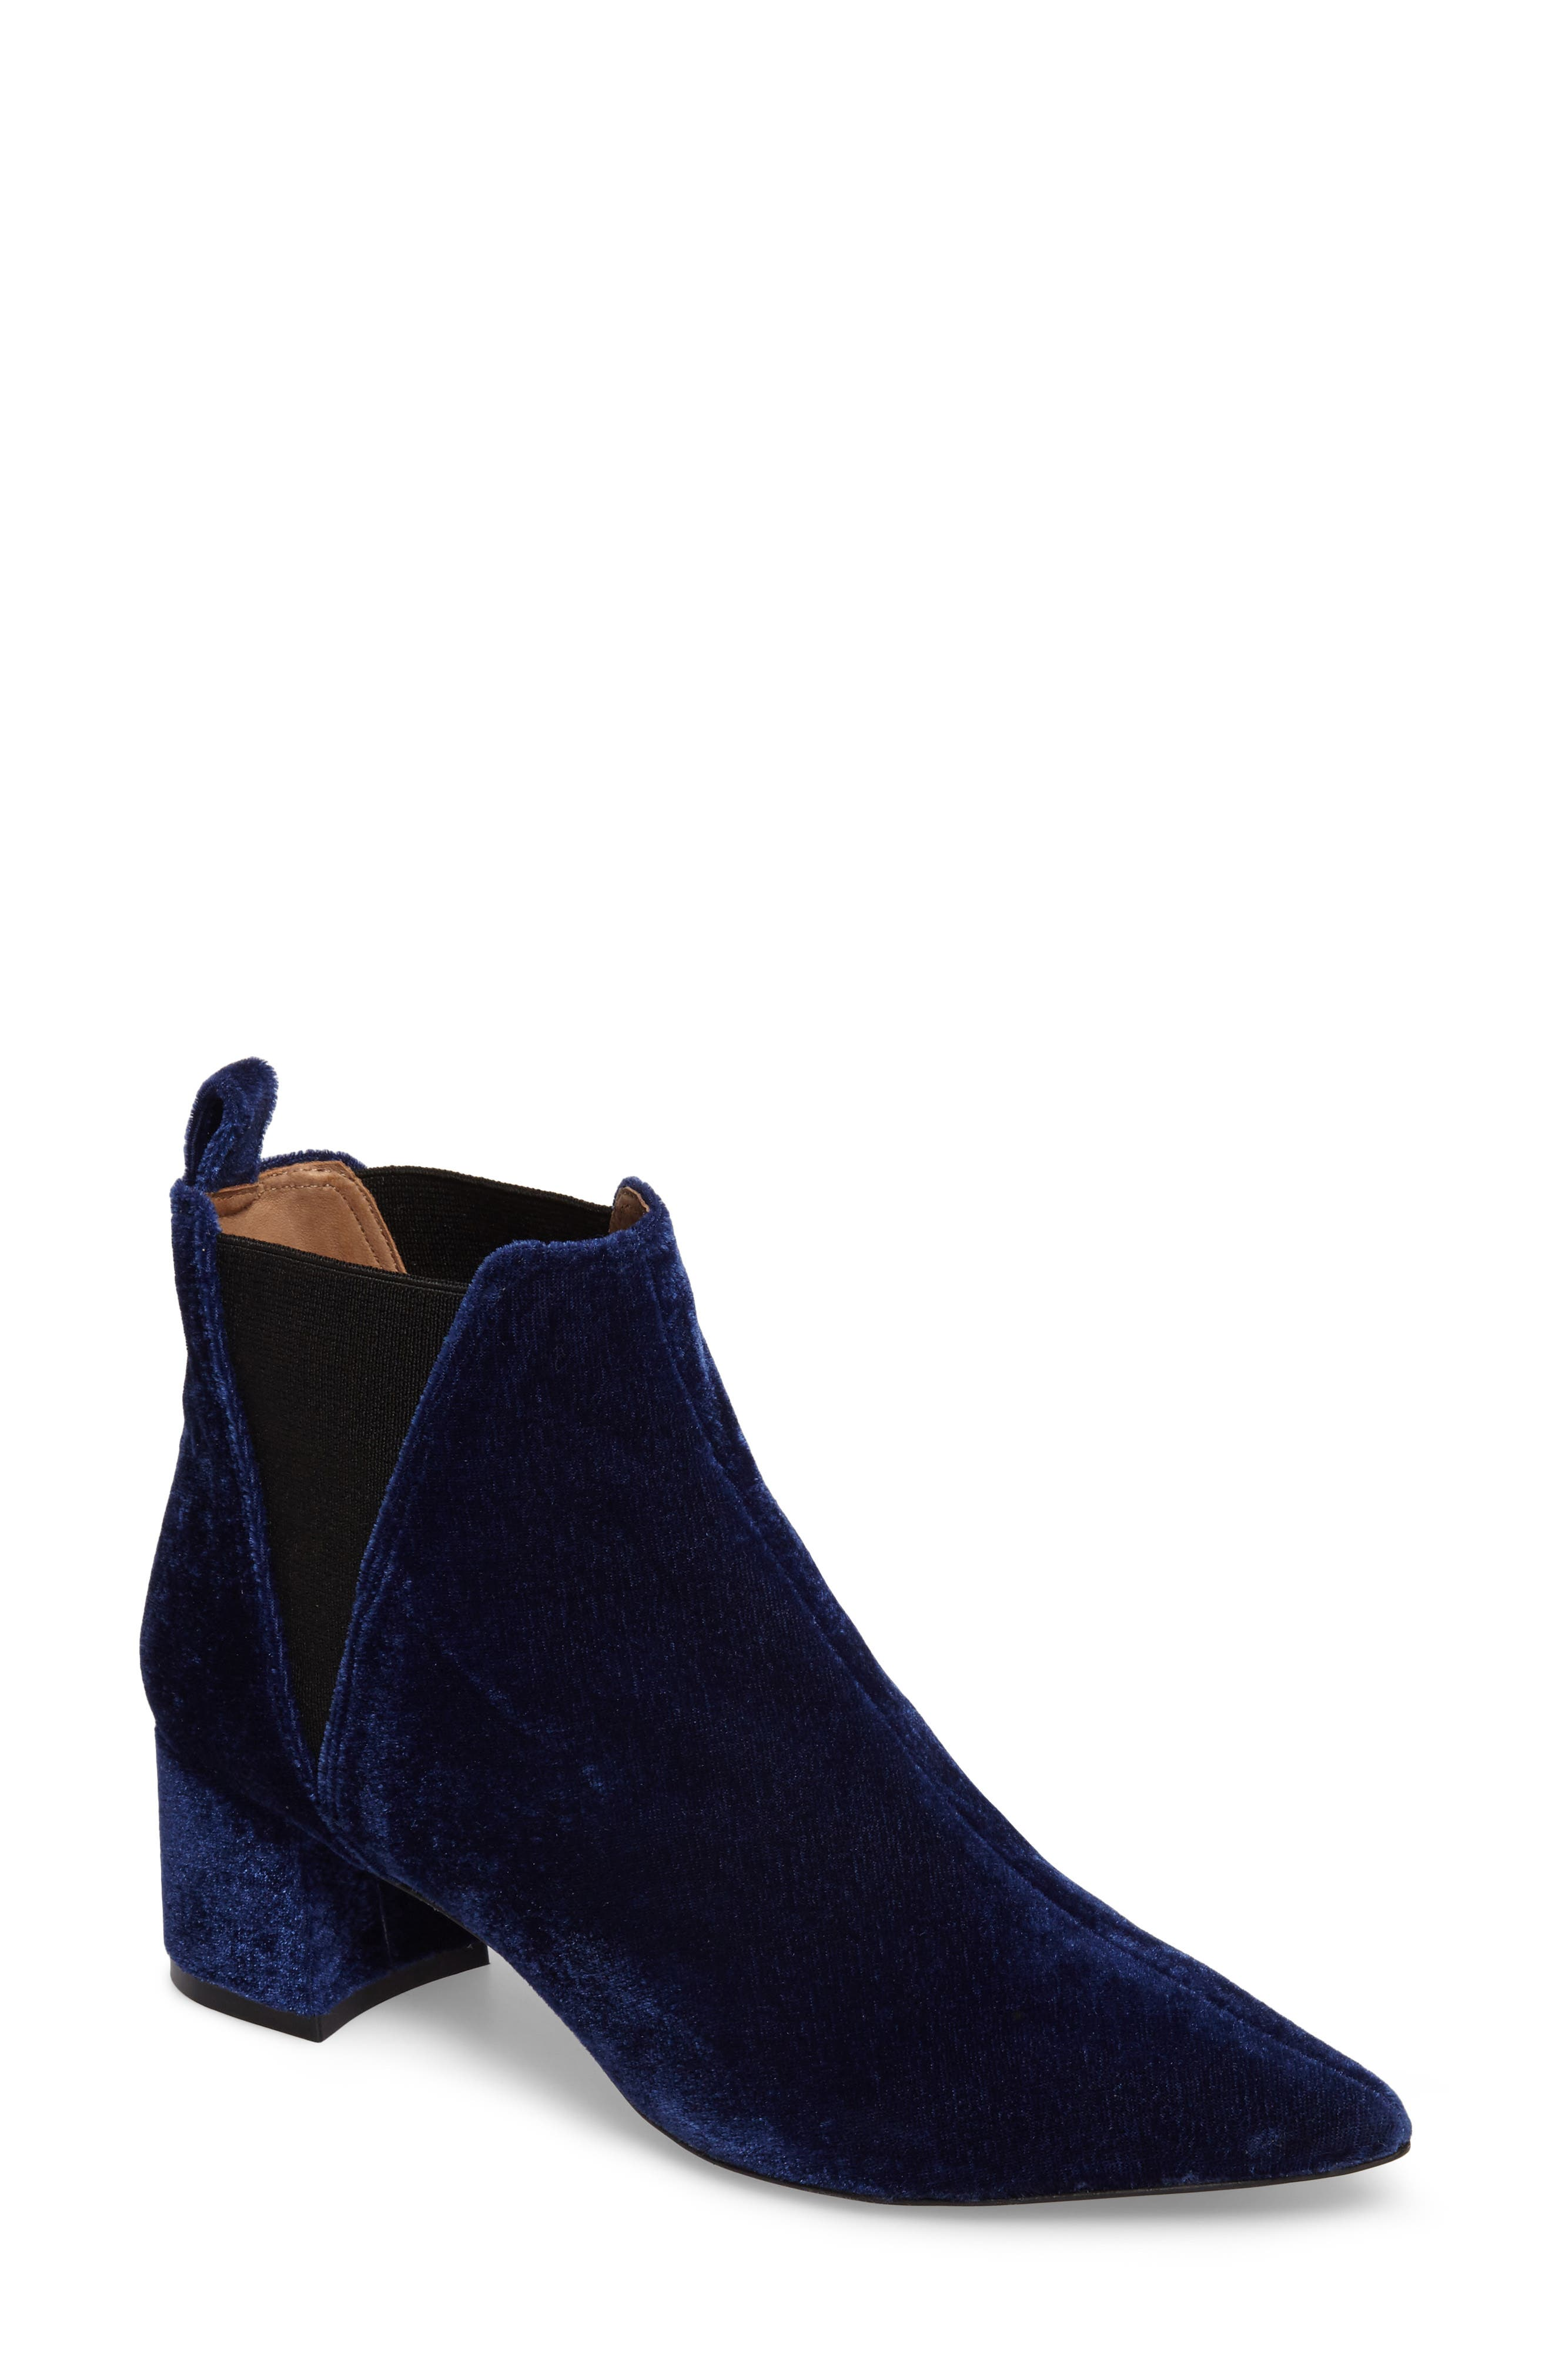 Renita Pointy Toe Chelsea Bootie,                             Main thumbnail 1, color,                             BLUE VELVET FABRIC